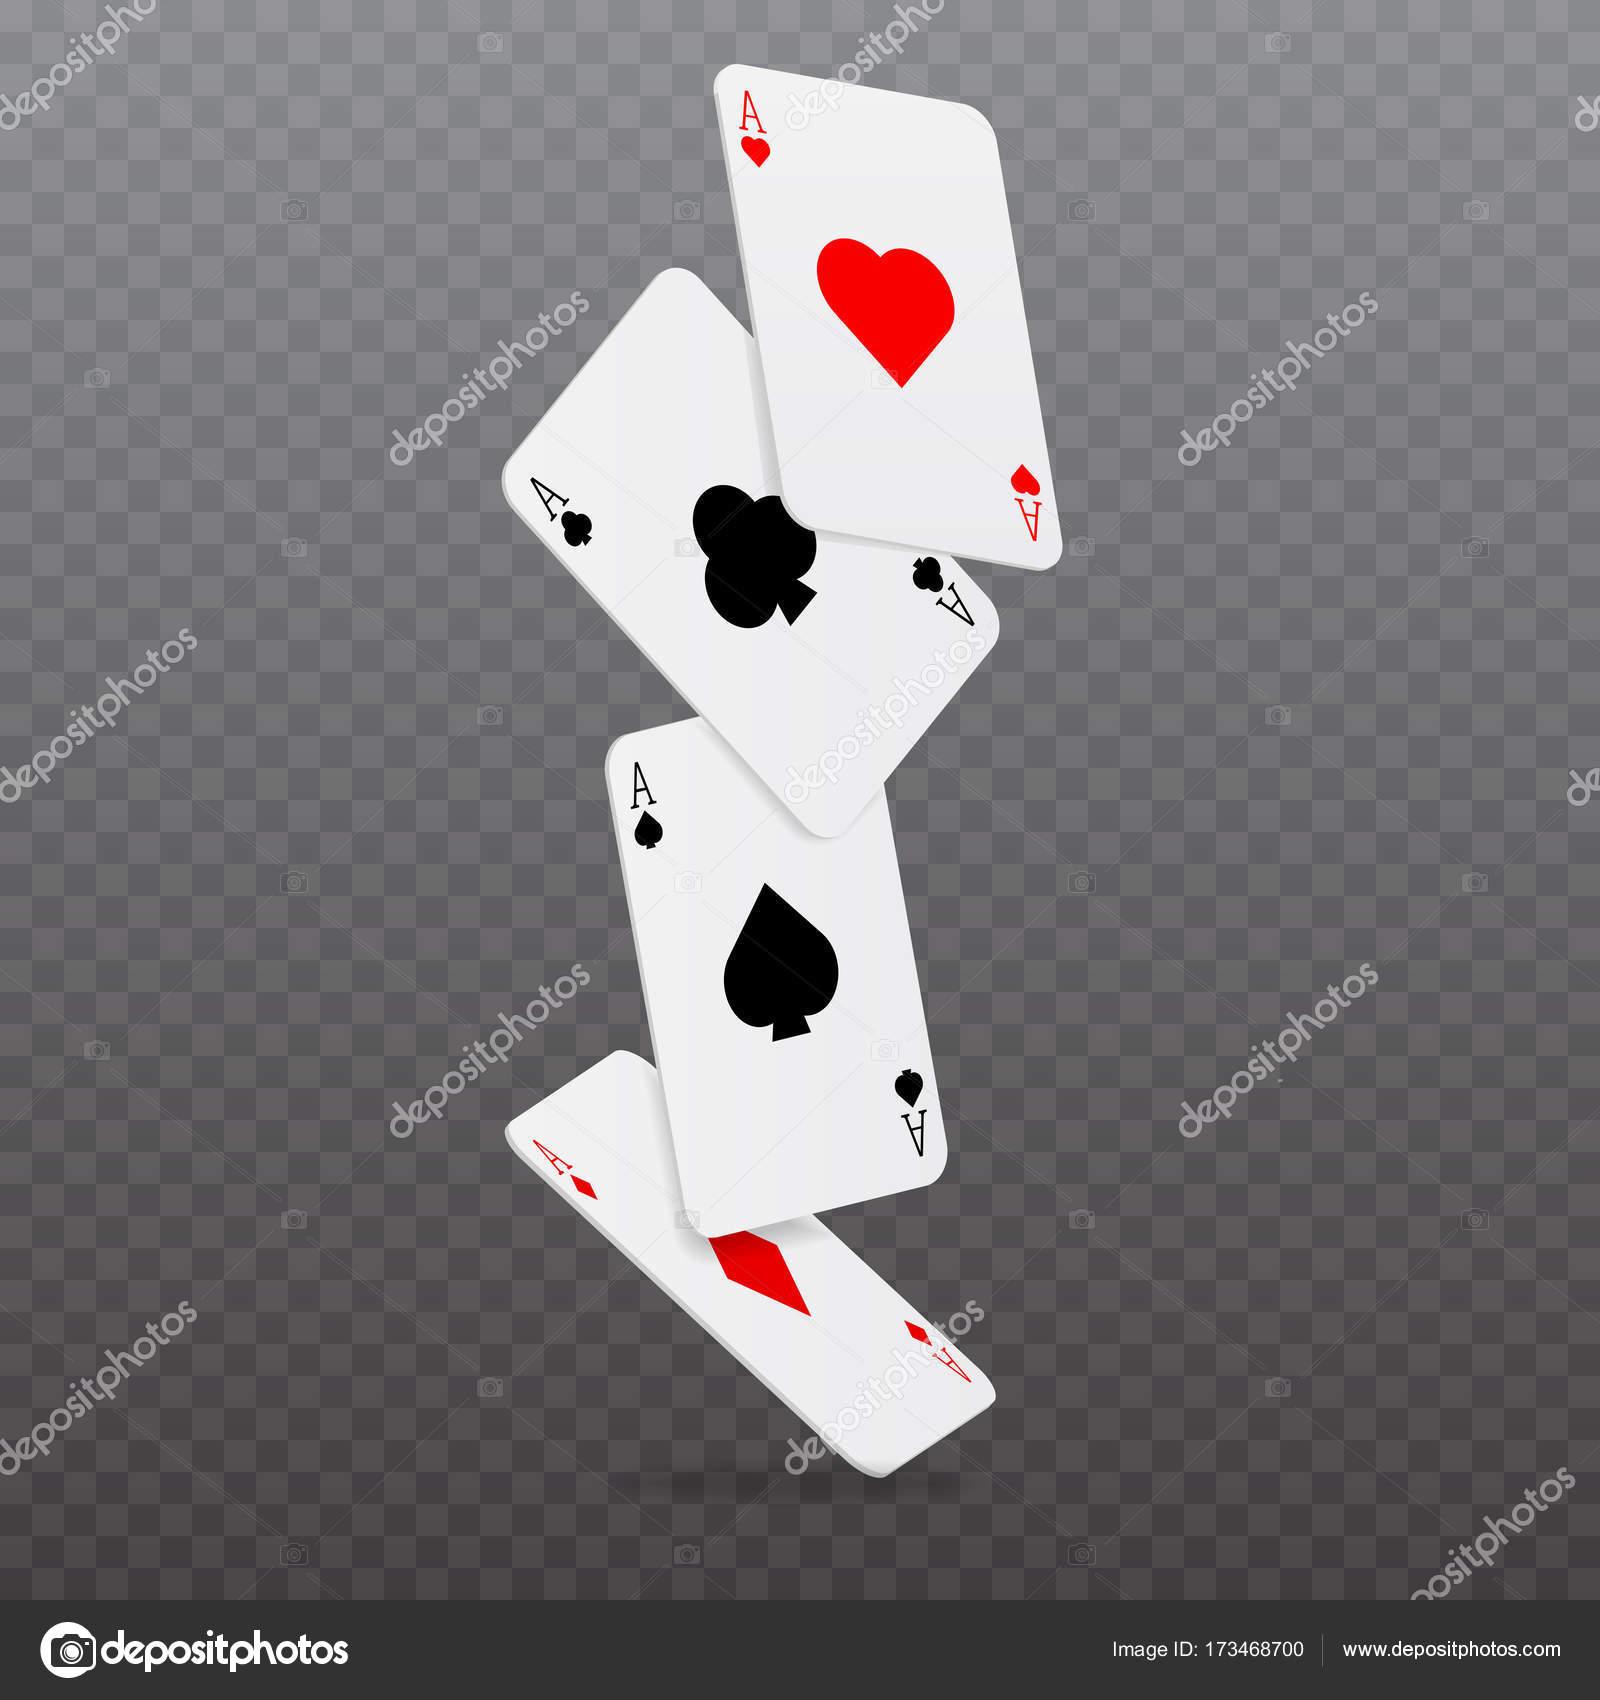 Caer Concepto Juego Cartas Poker Casino Ilustracion Vector Vector